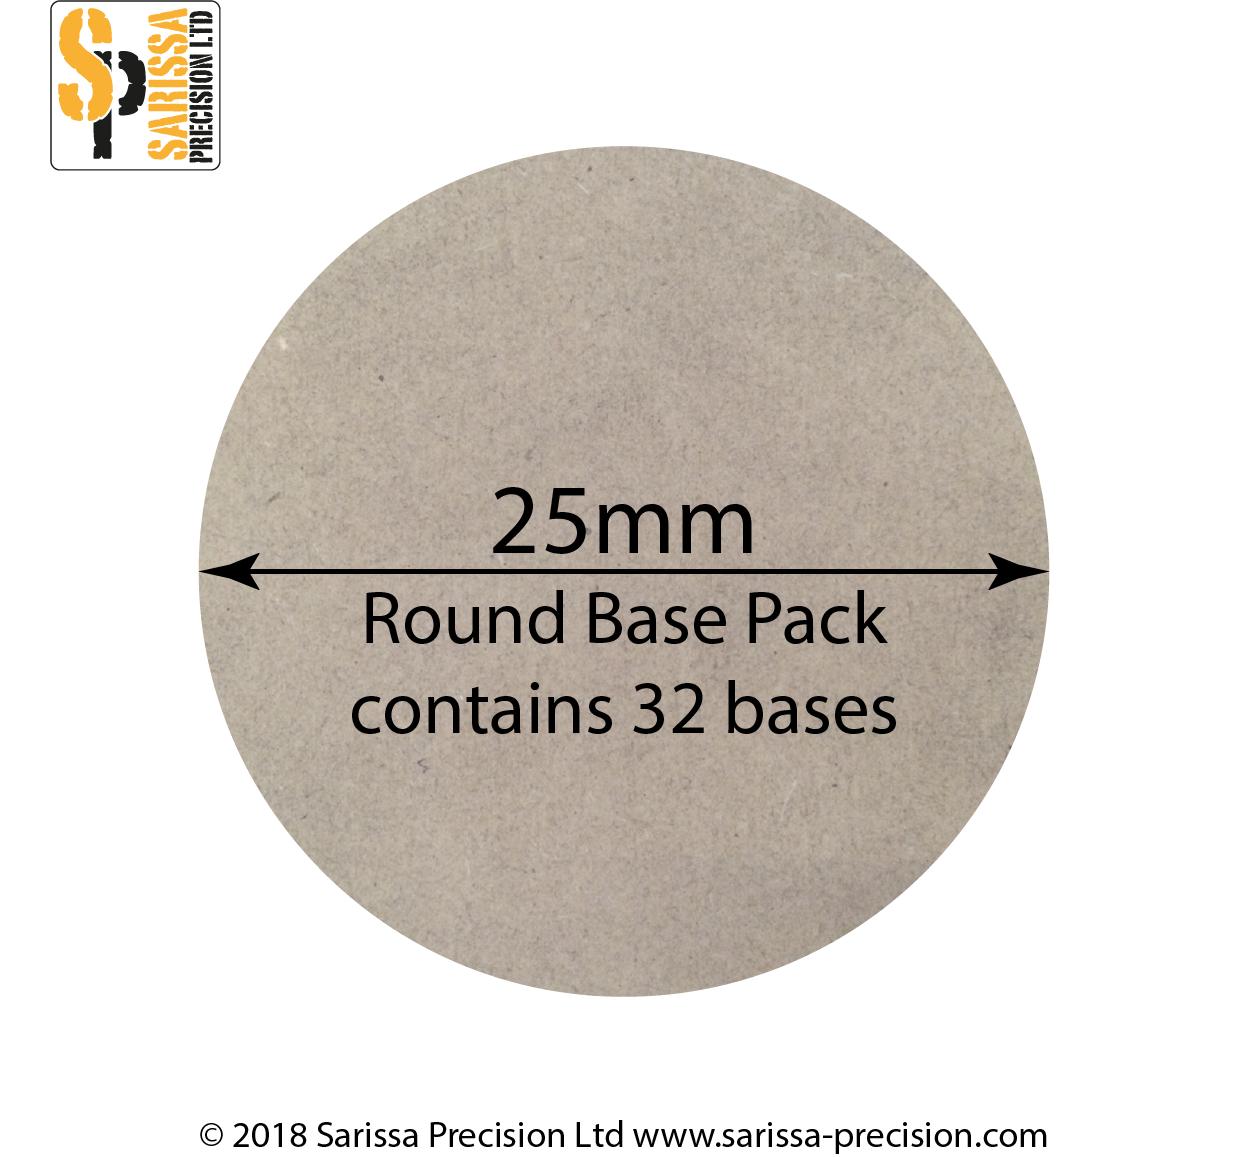 25mm Round Base, Sarissa Precision